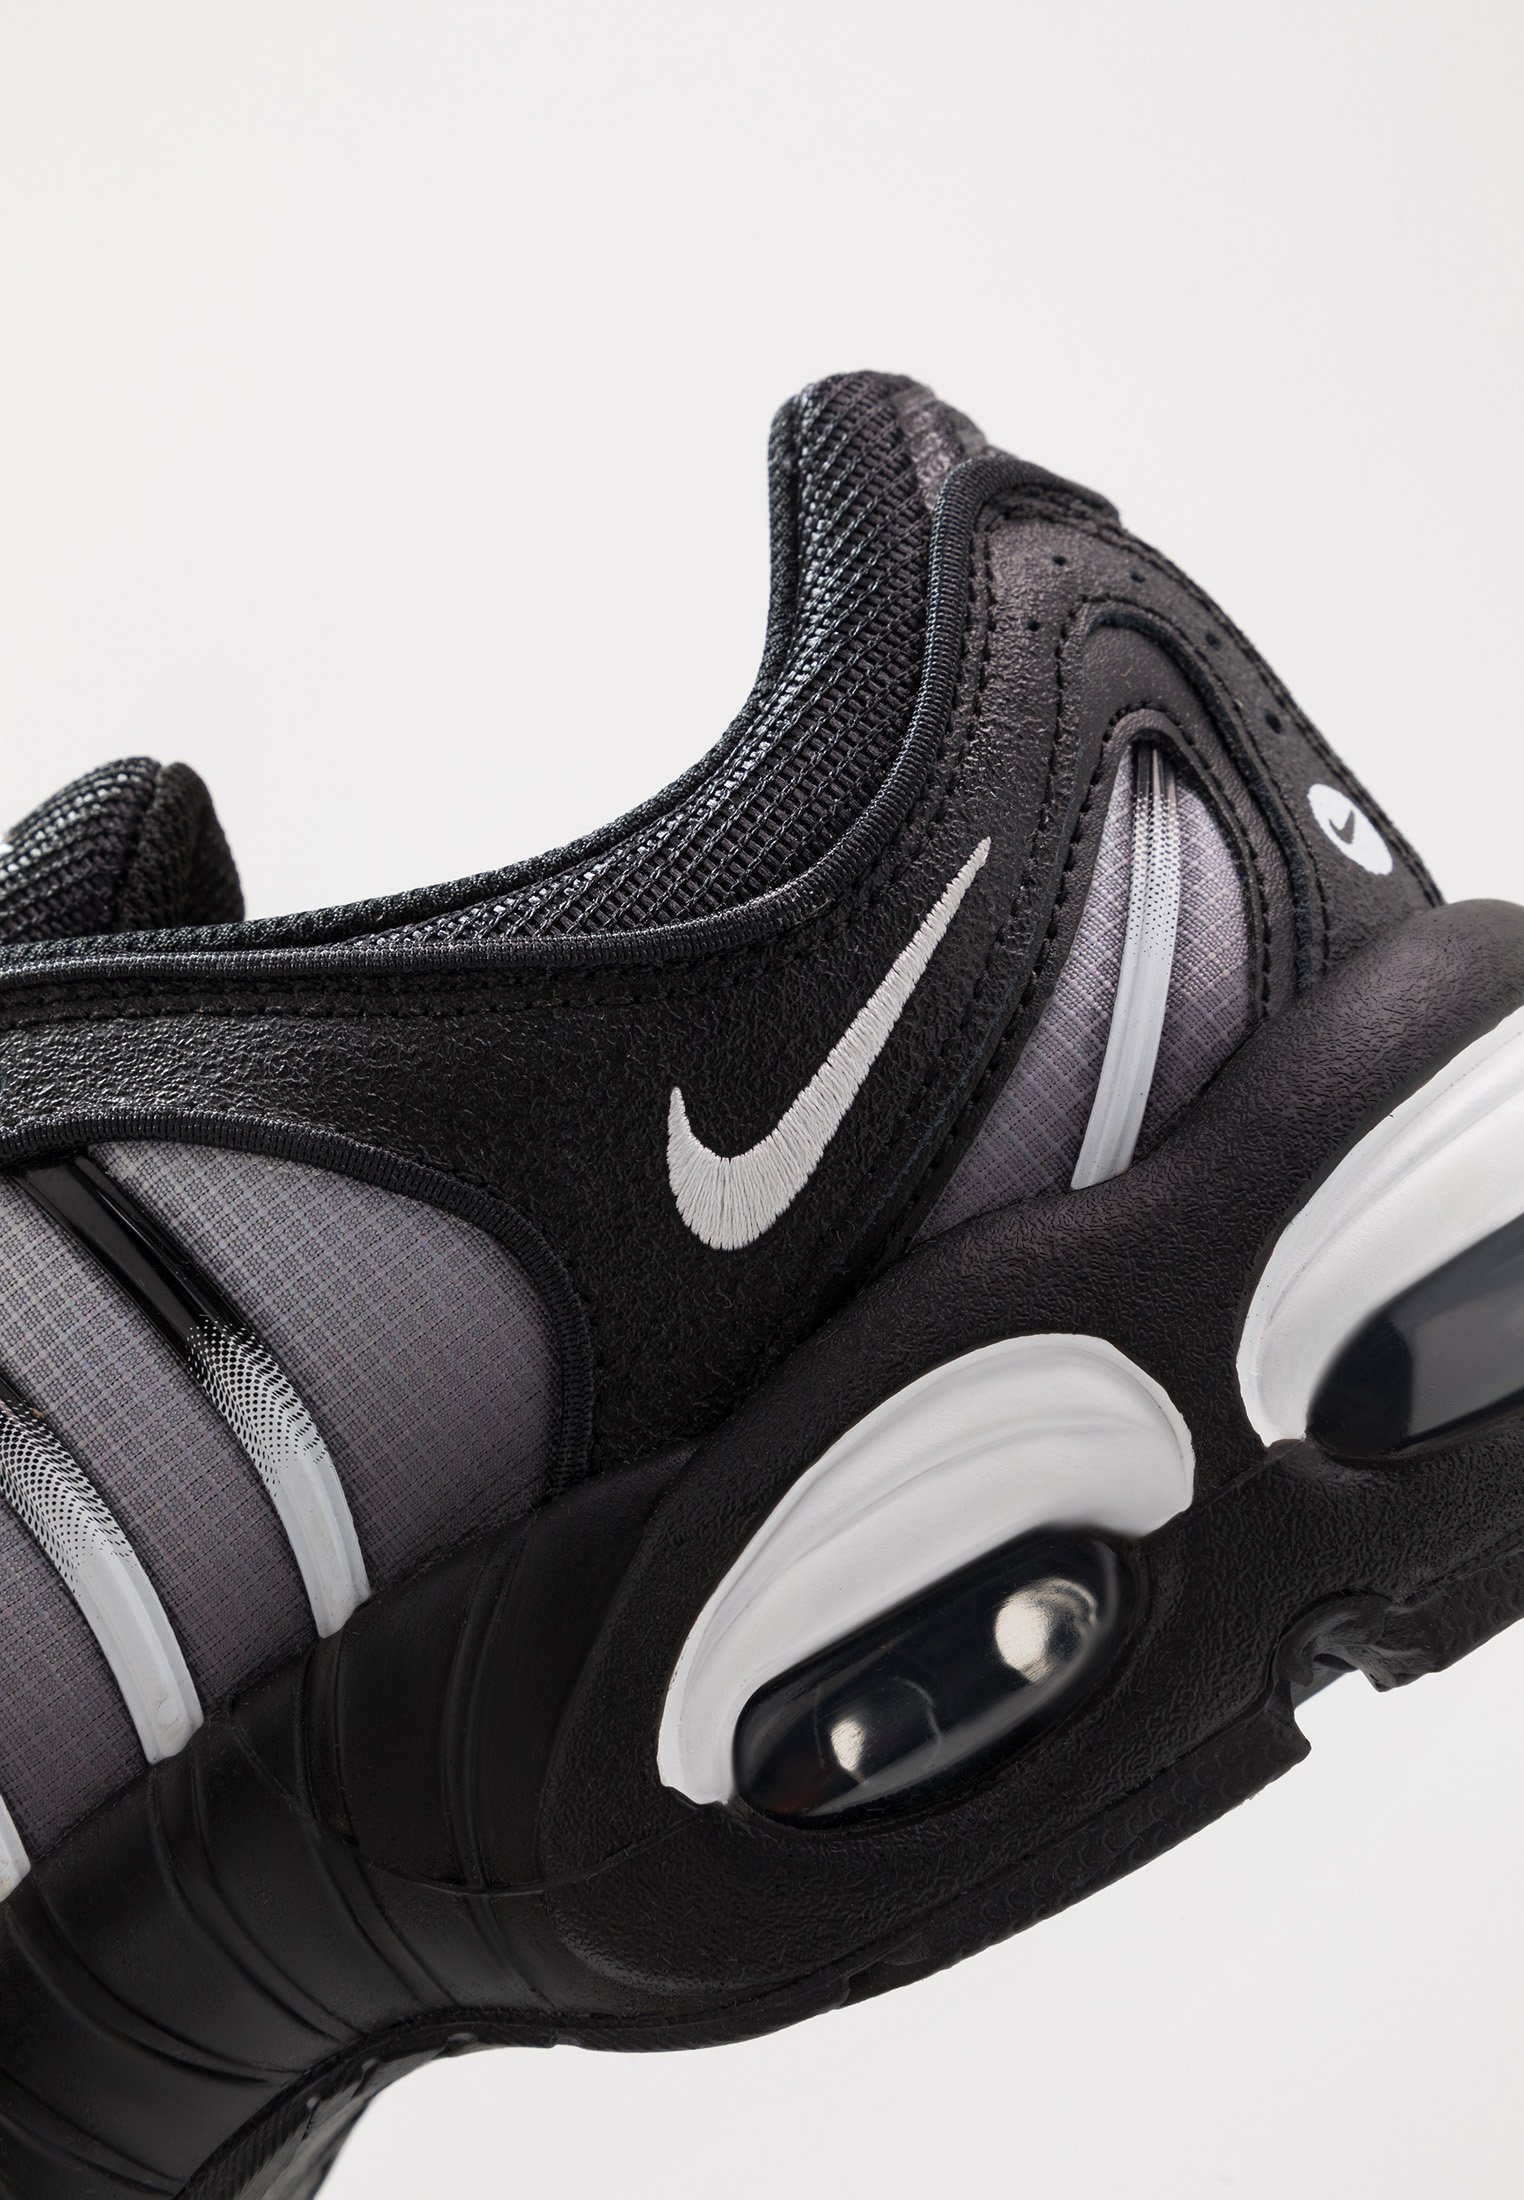 AIR IVBaskets MAX TAILWIND basses Sportswear black Nike white OuPZXikTw